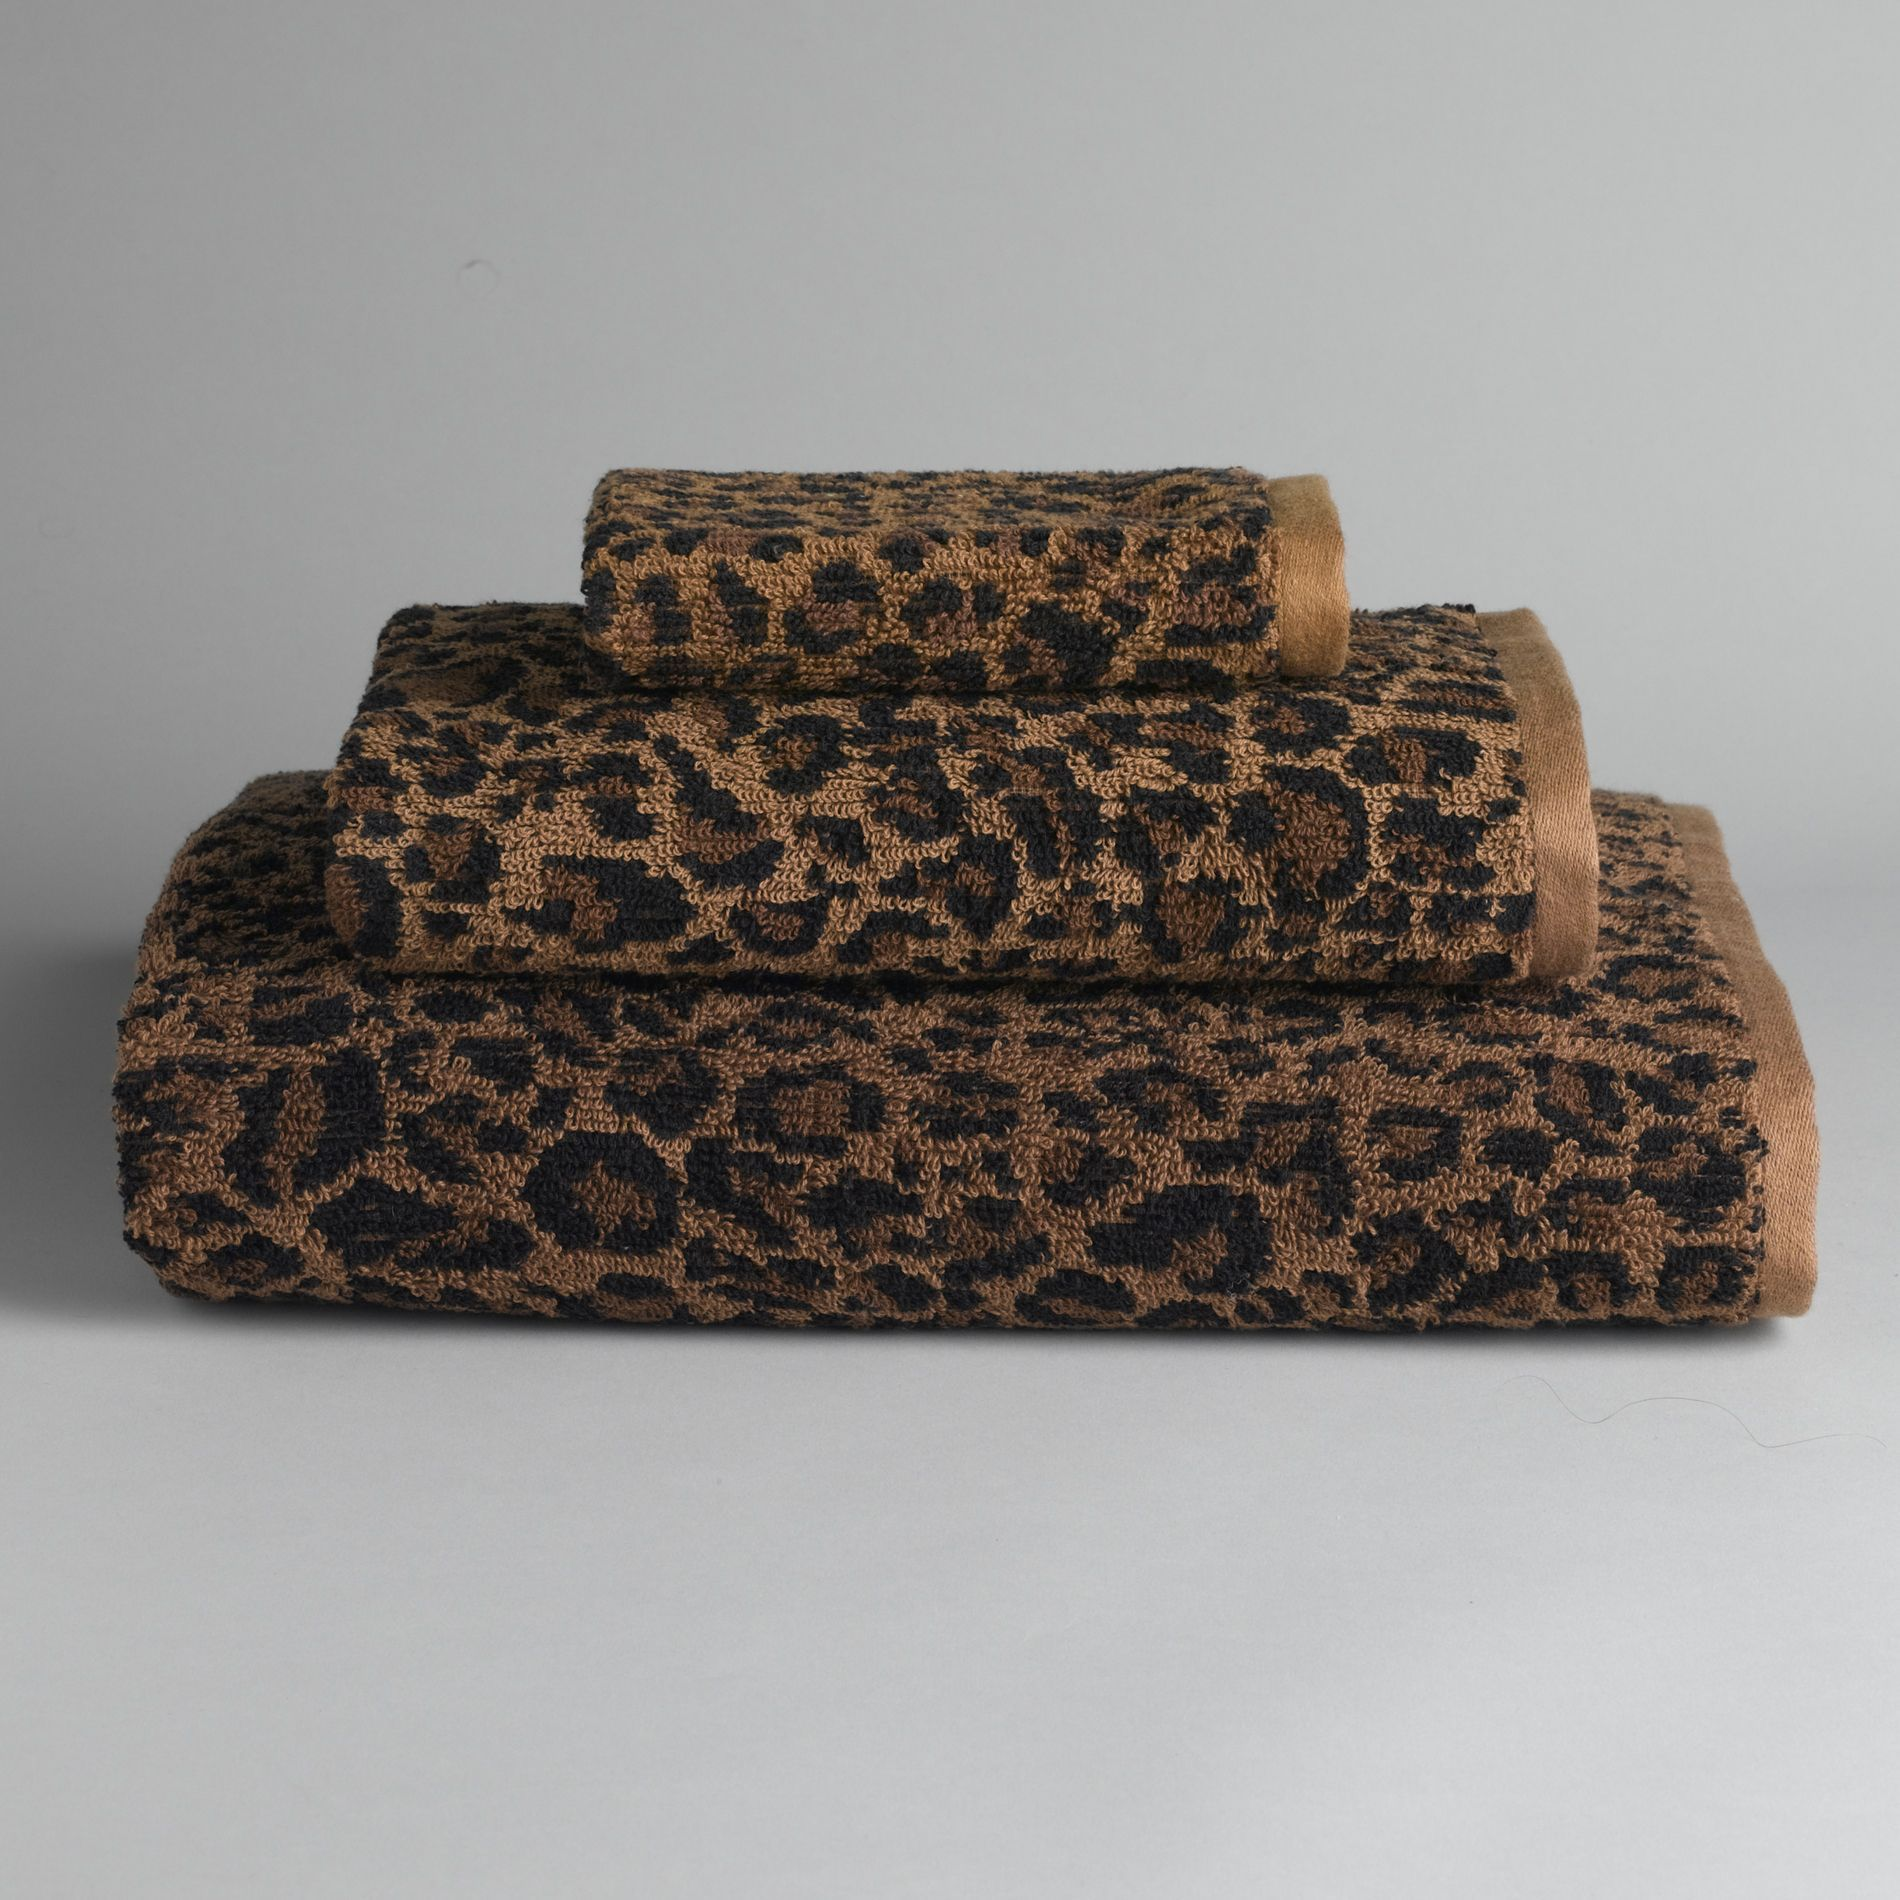 Kmart Bathroom Towels Decorative Bamboo Ladder Kmart Colormate Soft And Plush Cotton B In 2020 Leopard Print Bathroom Leopard Print Accessories Leopard Bathroom Decor